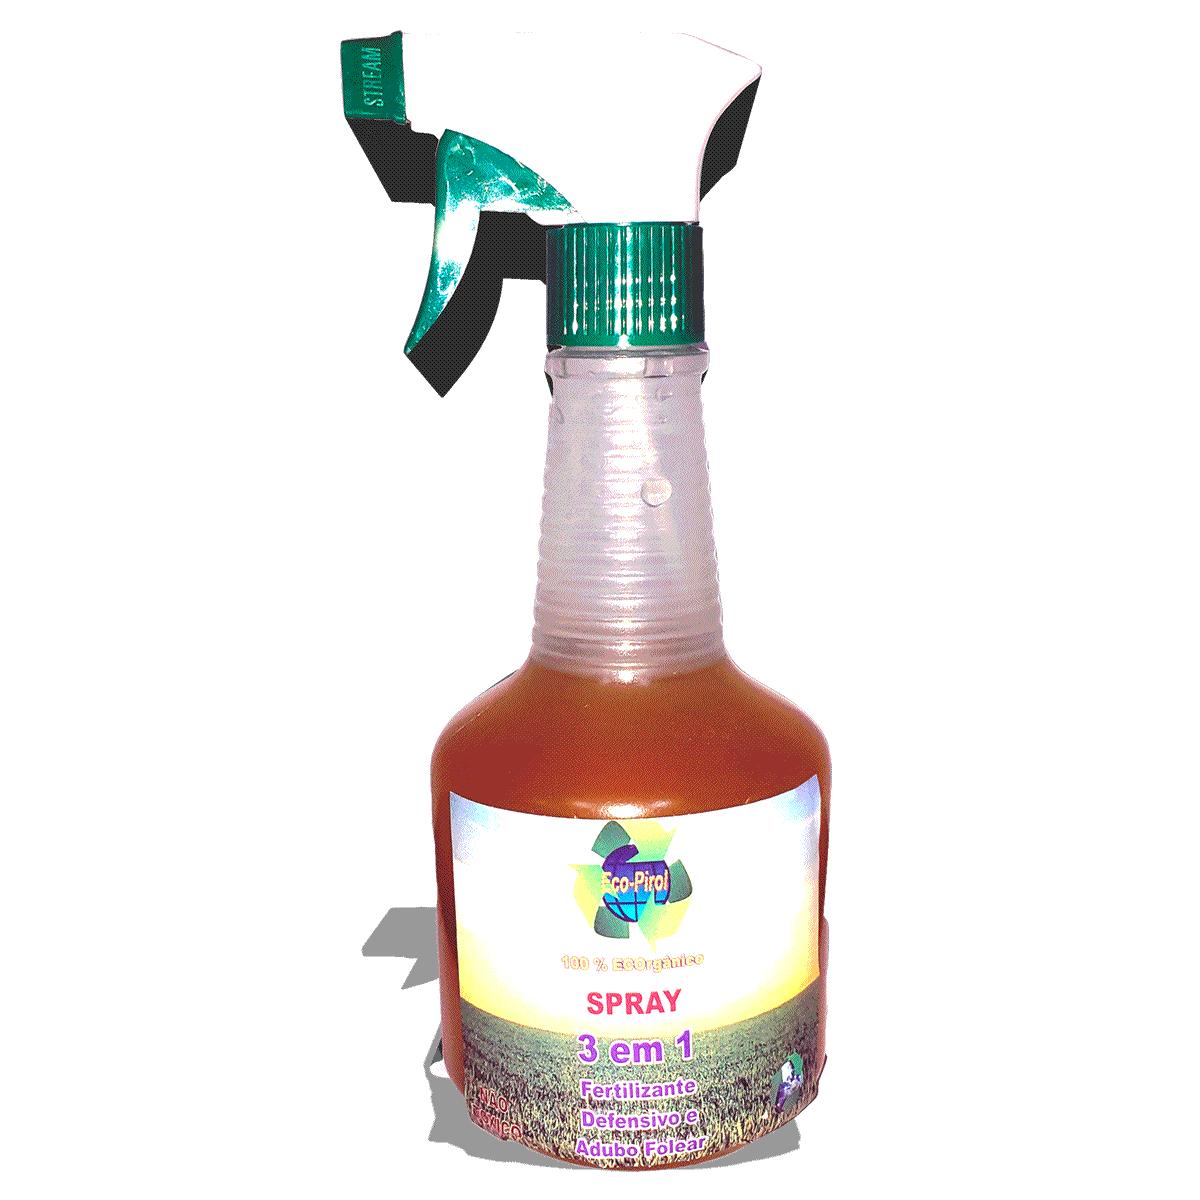 3 em 1 Spray - Ecopirol 500 ml - Defensivo, Fertilizante e Adubo Folear